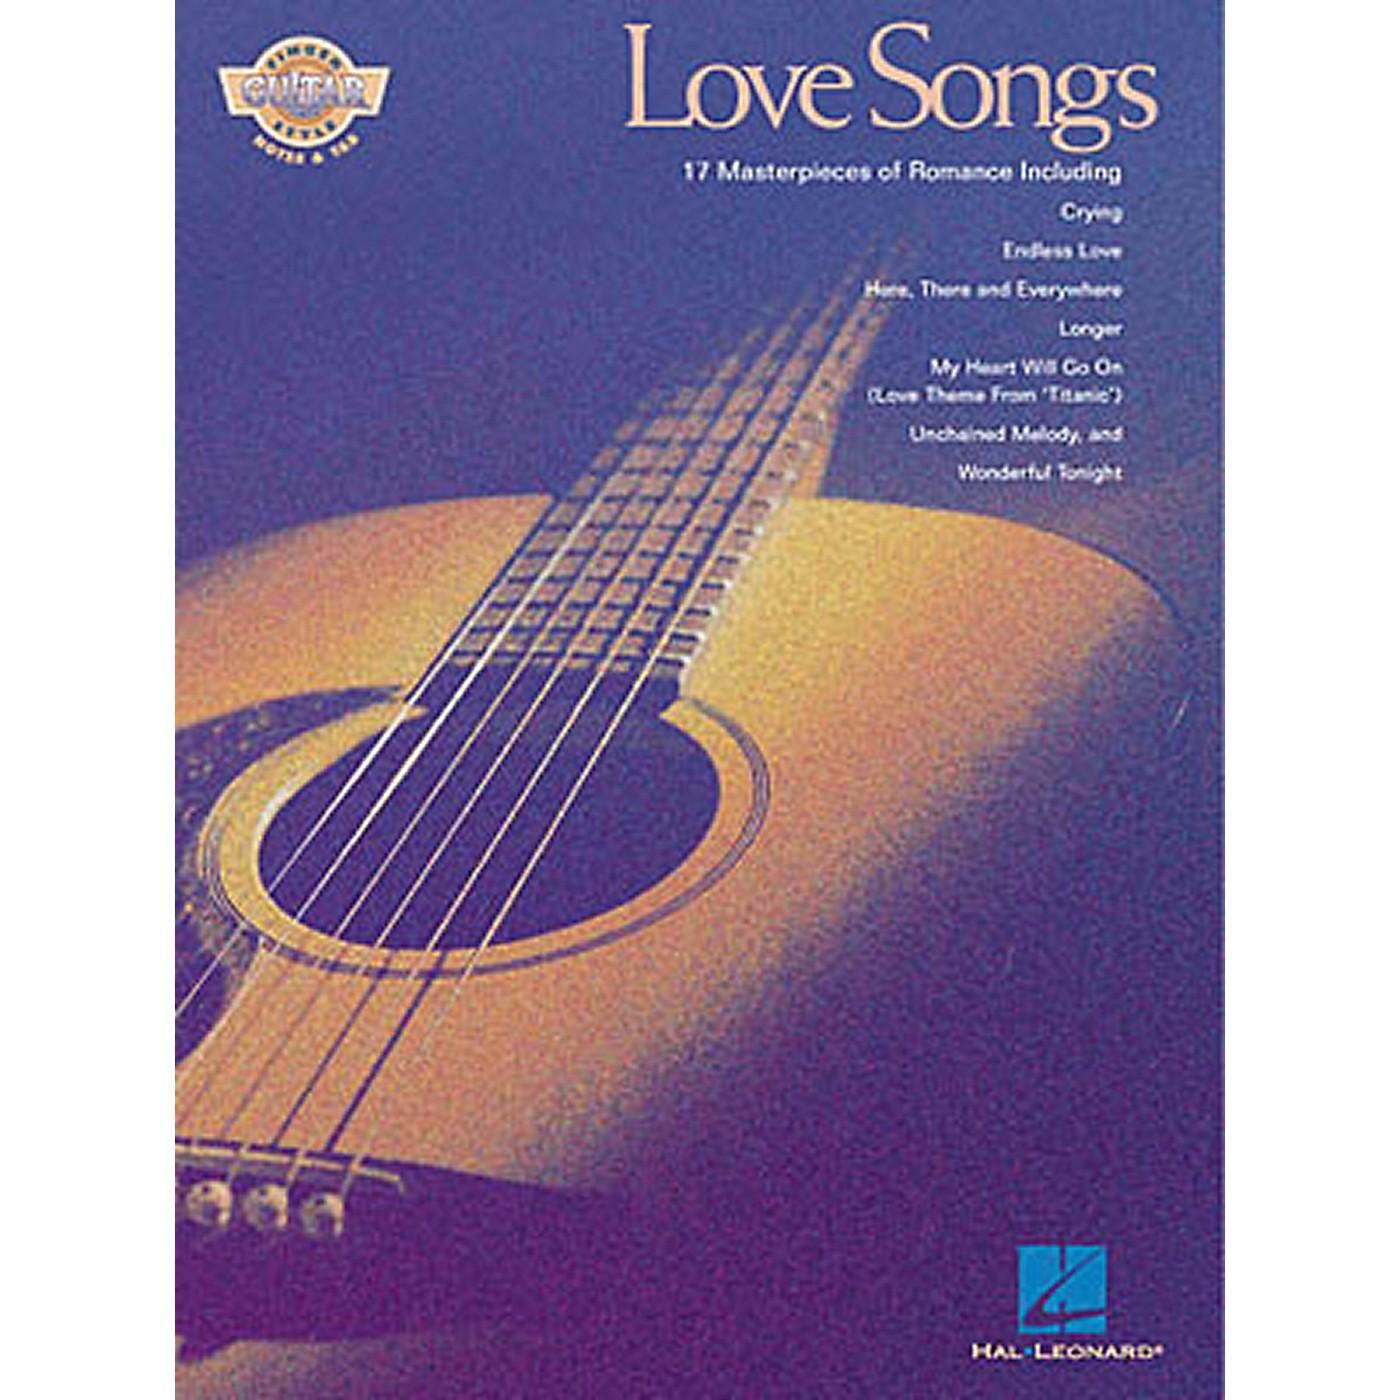 Hal Leonard Love Songs Fingerstyle Guitar Tab Songbook thumbnail